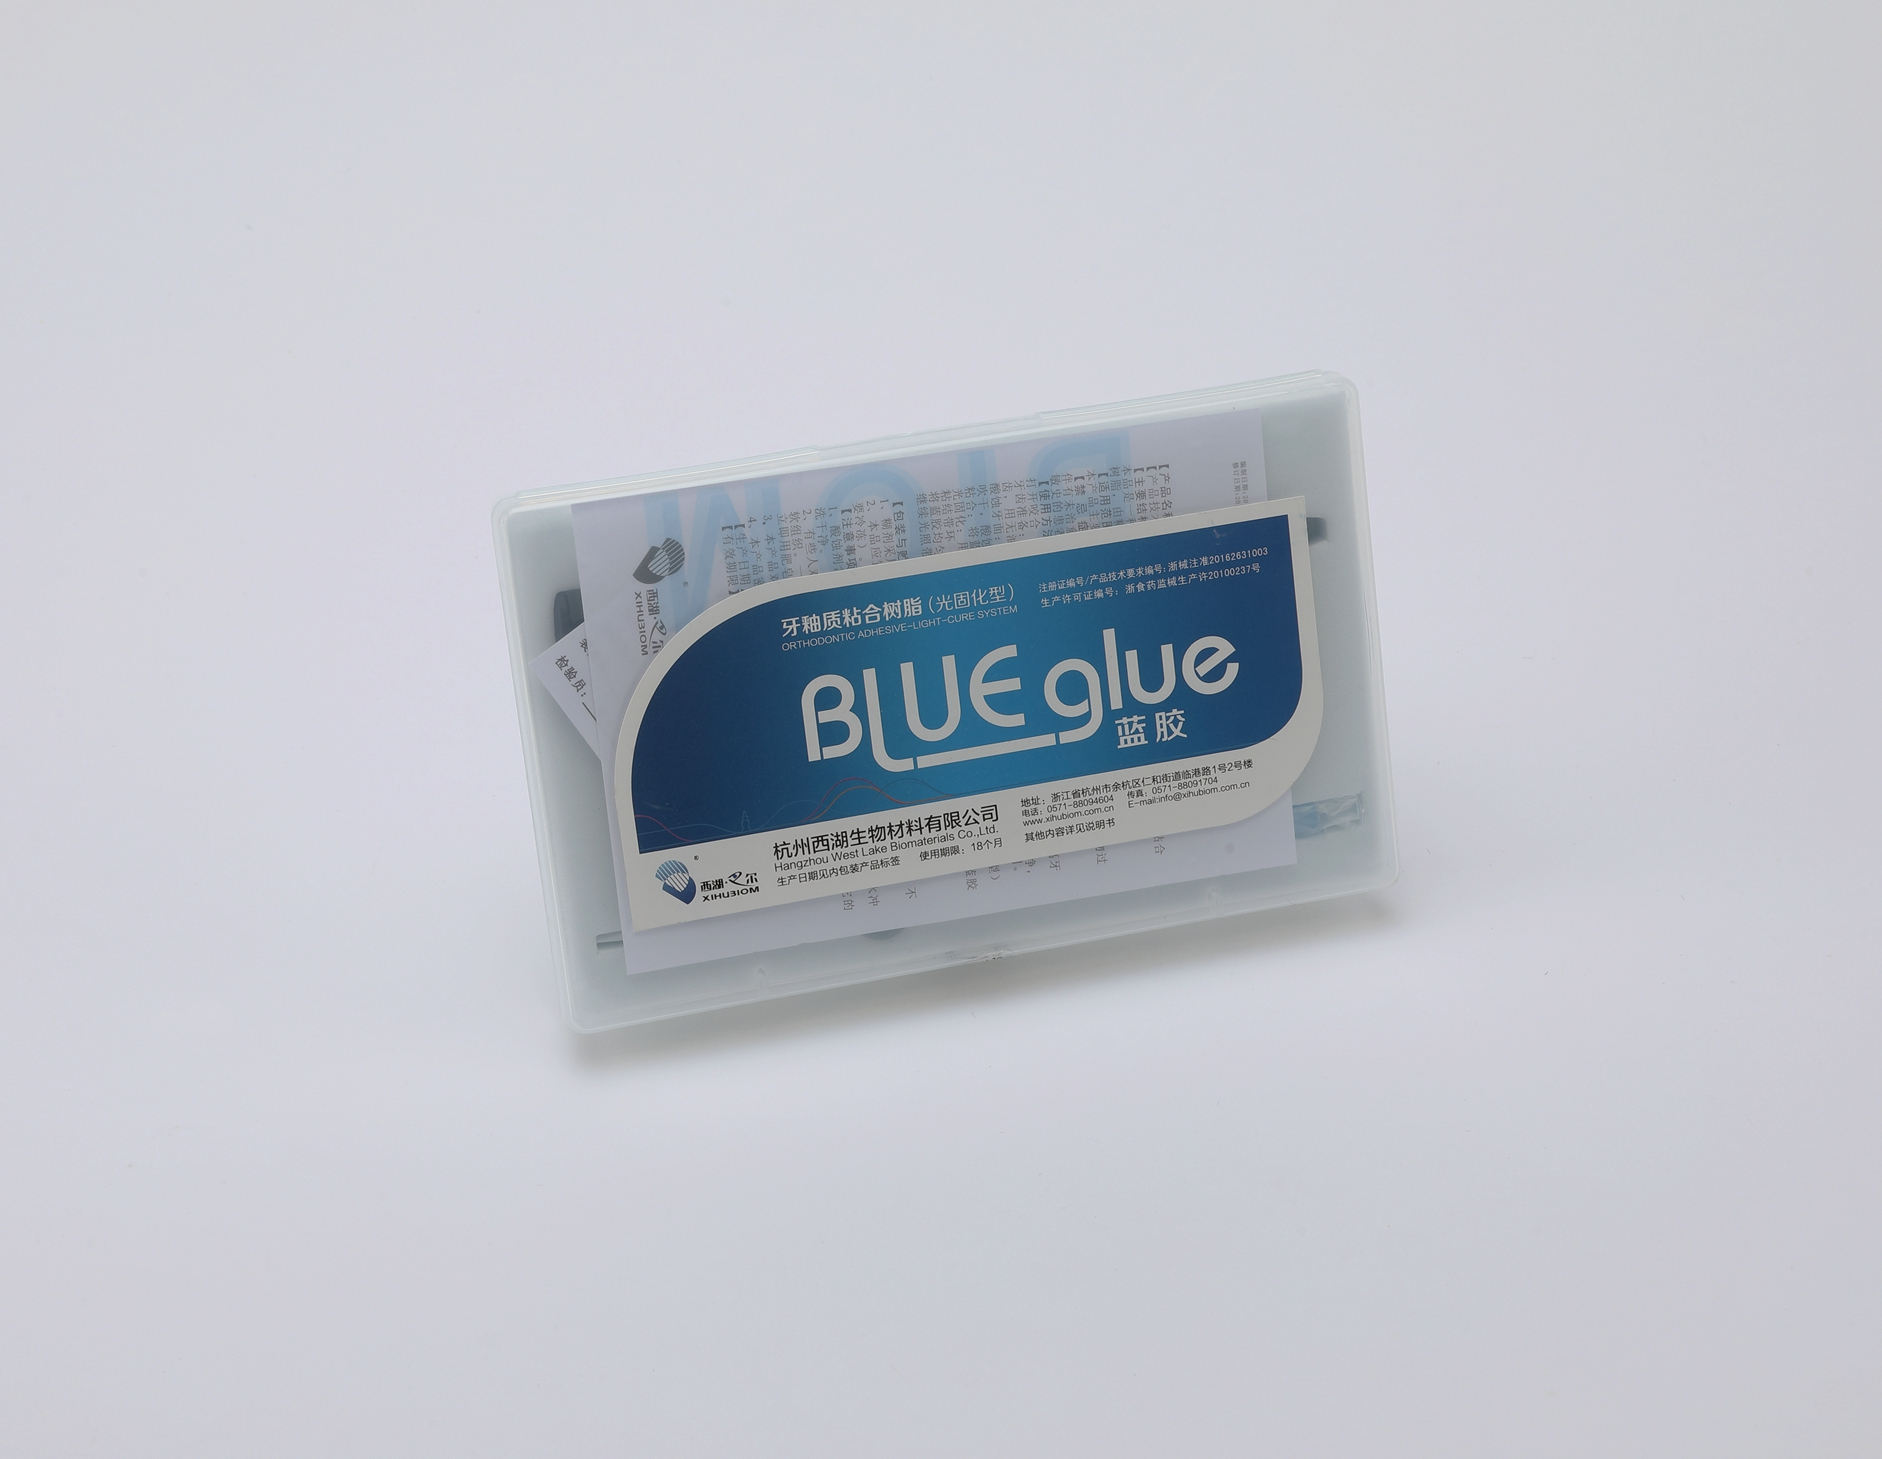 blueglue藍膠